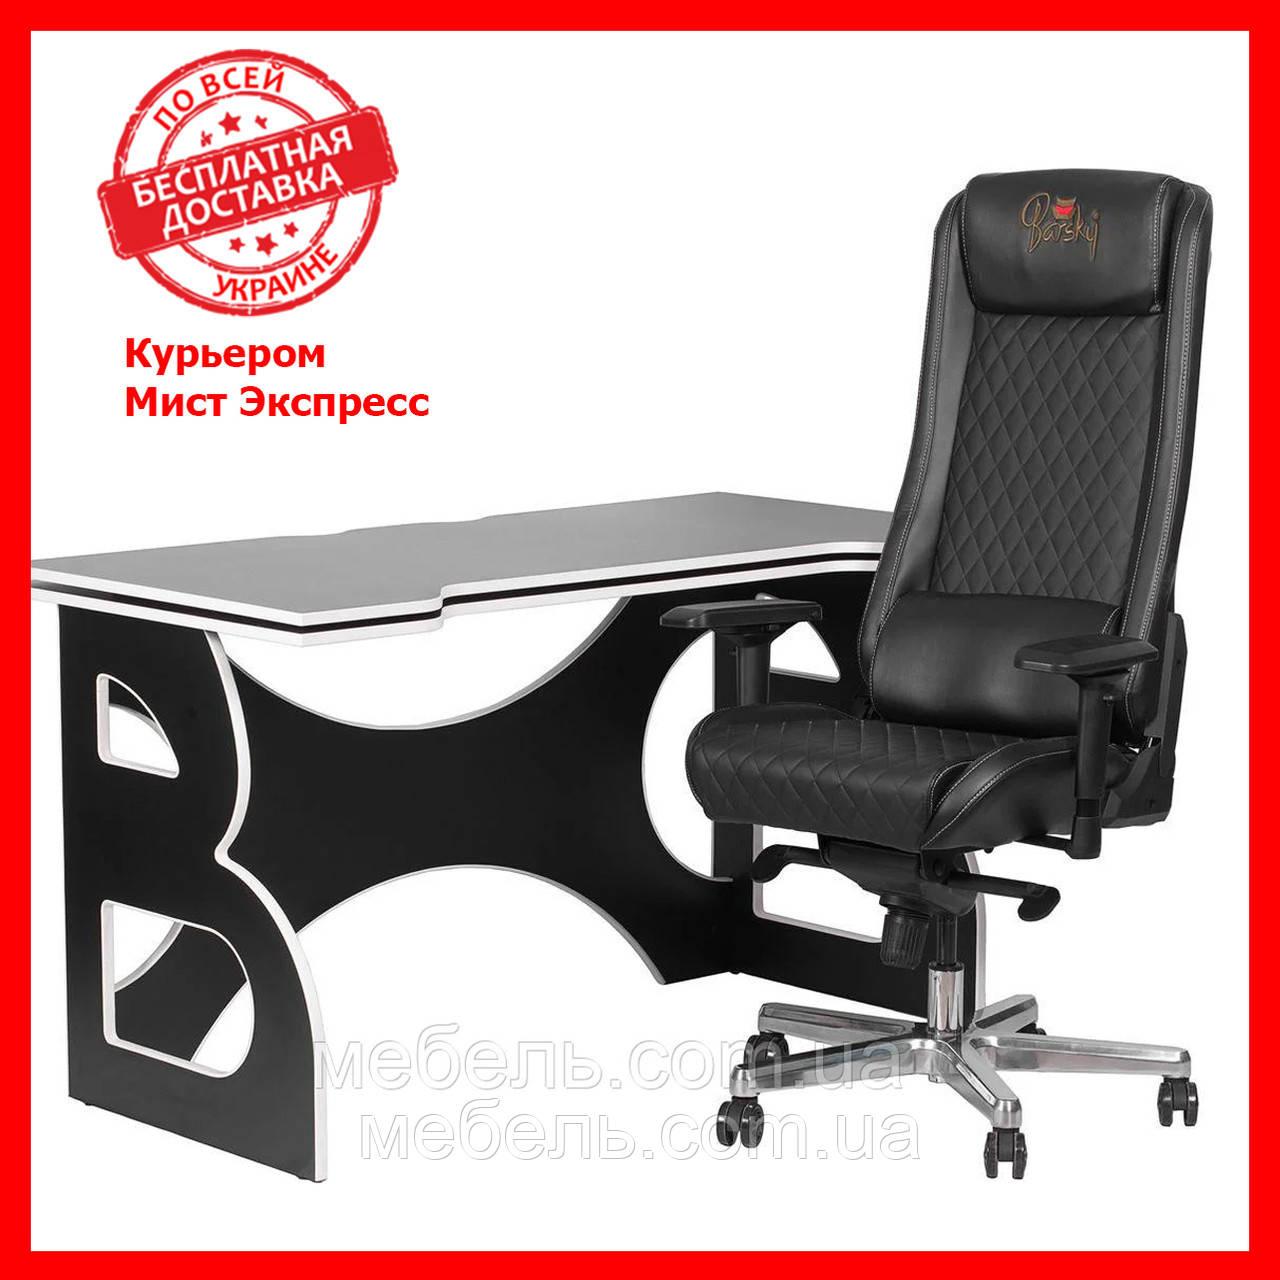 Компьютерный стол со стулом Barsky HG-06/GB-01 Homework Game Black/White,  геймерская станция